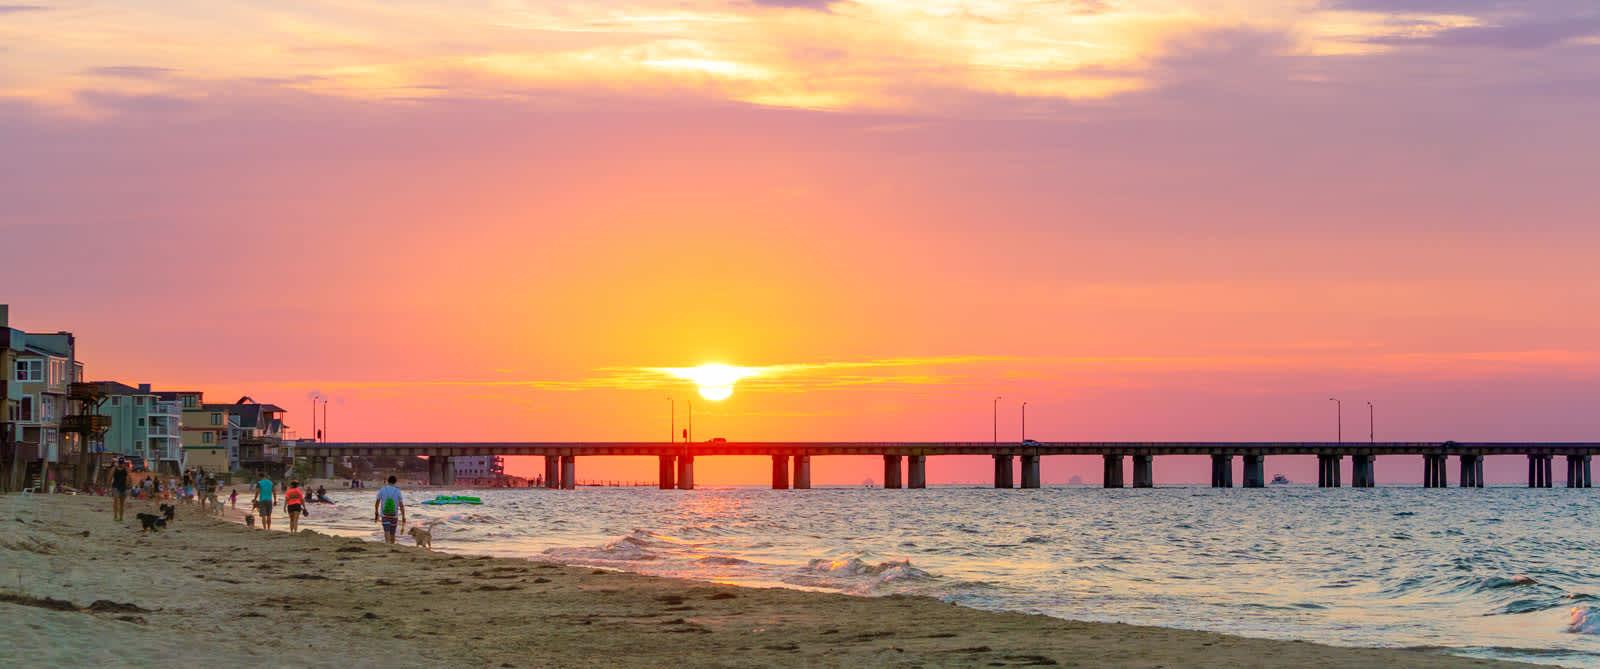 bigstock-Sundown-At-The-Beach-95818136